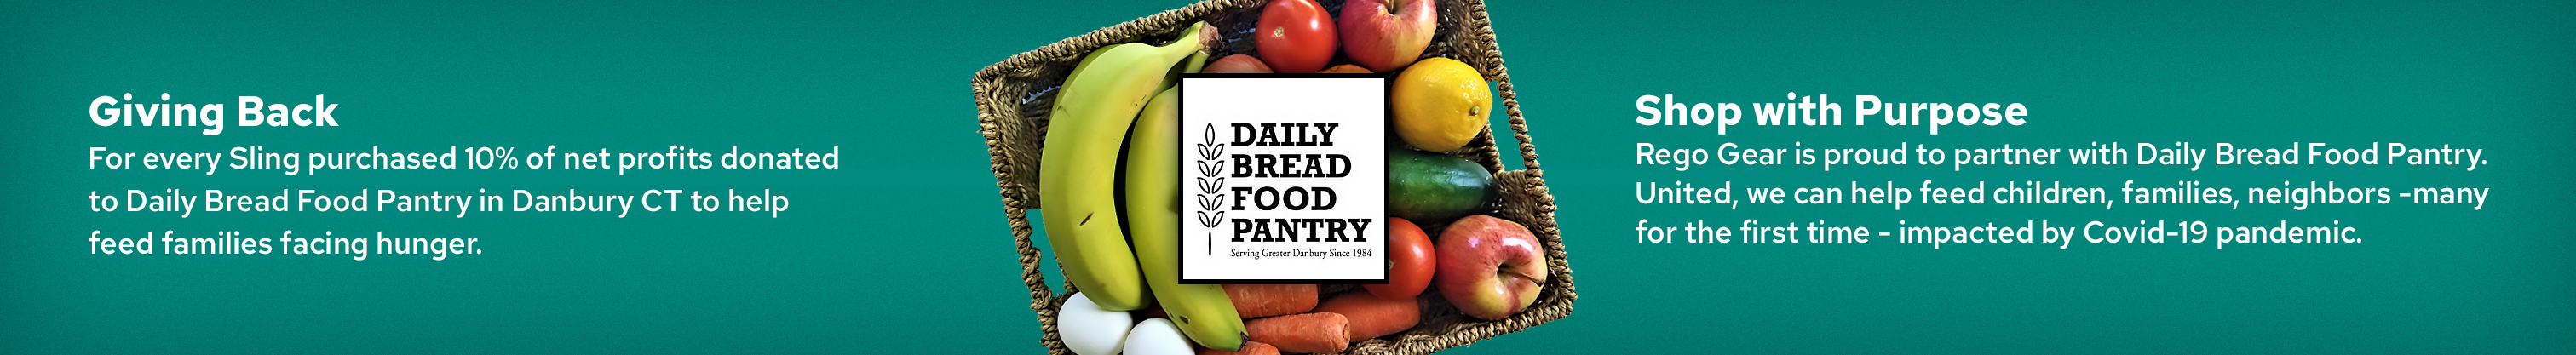 regogear-dailybreadfoodpantry-banner.jpg